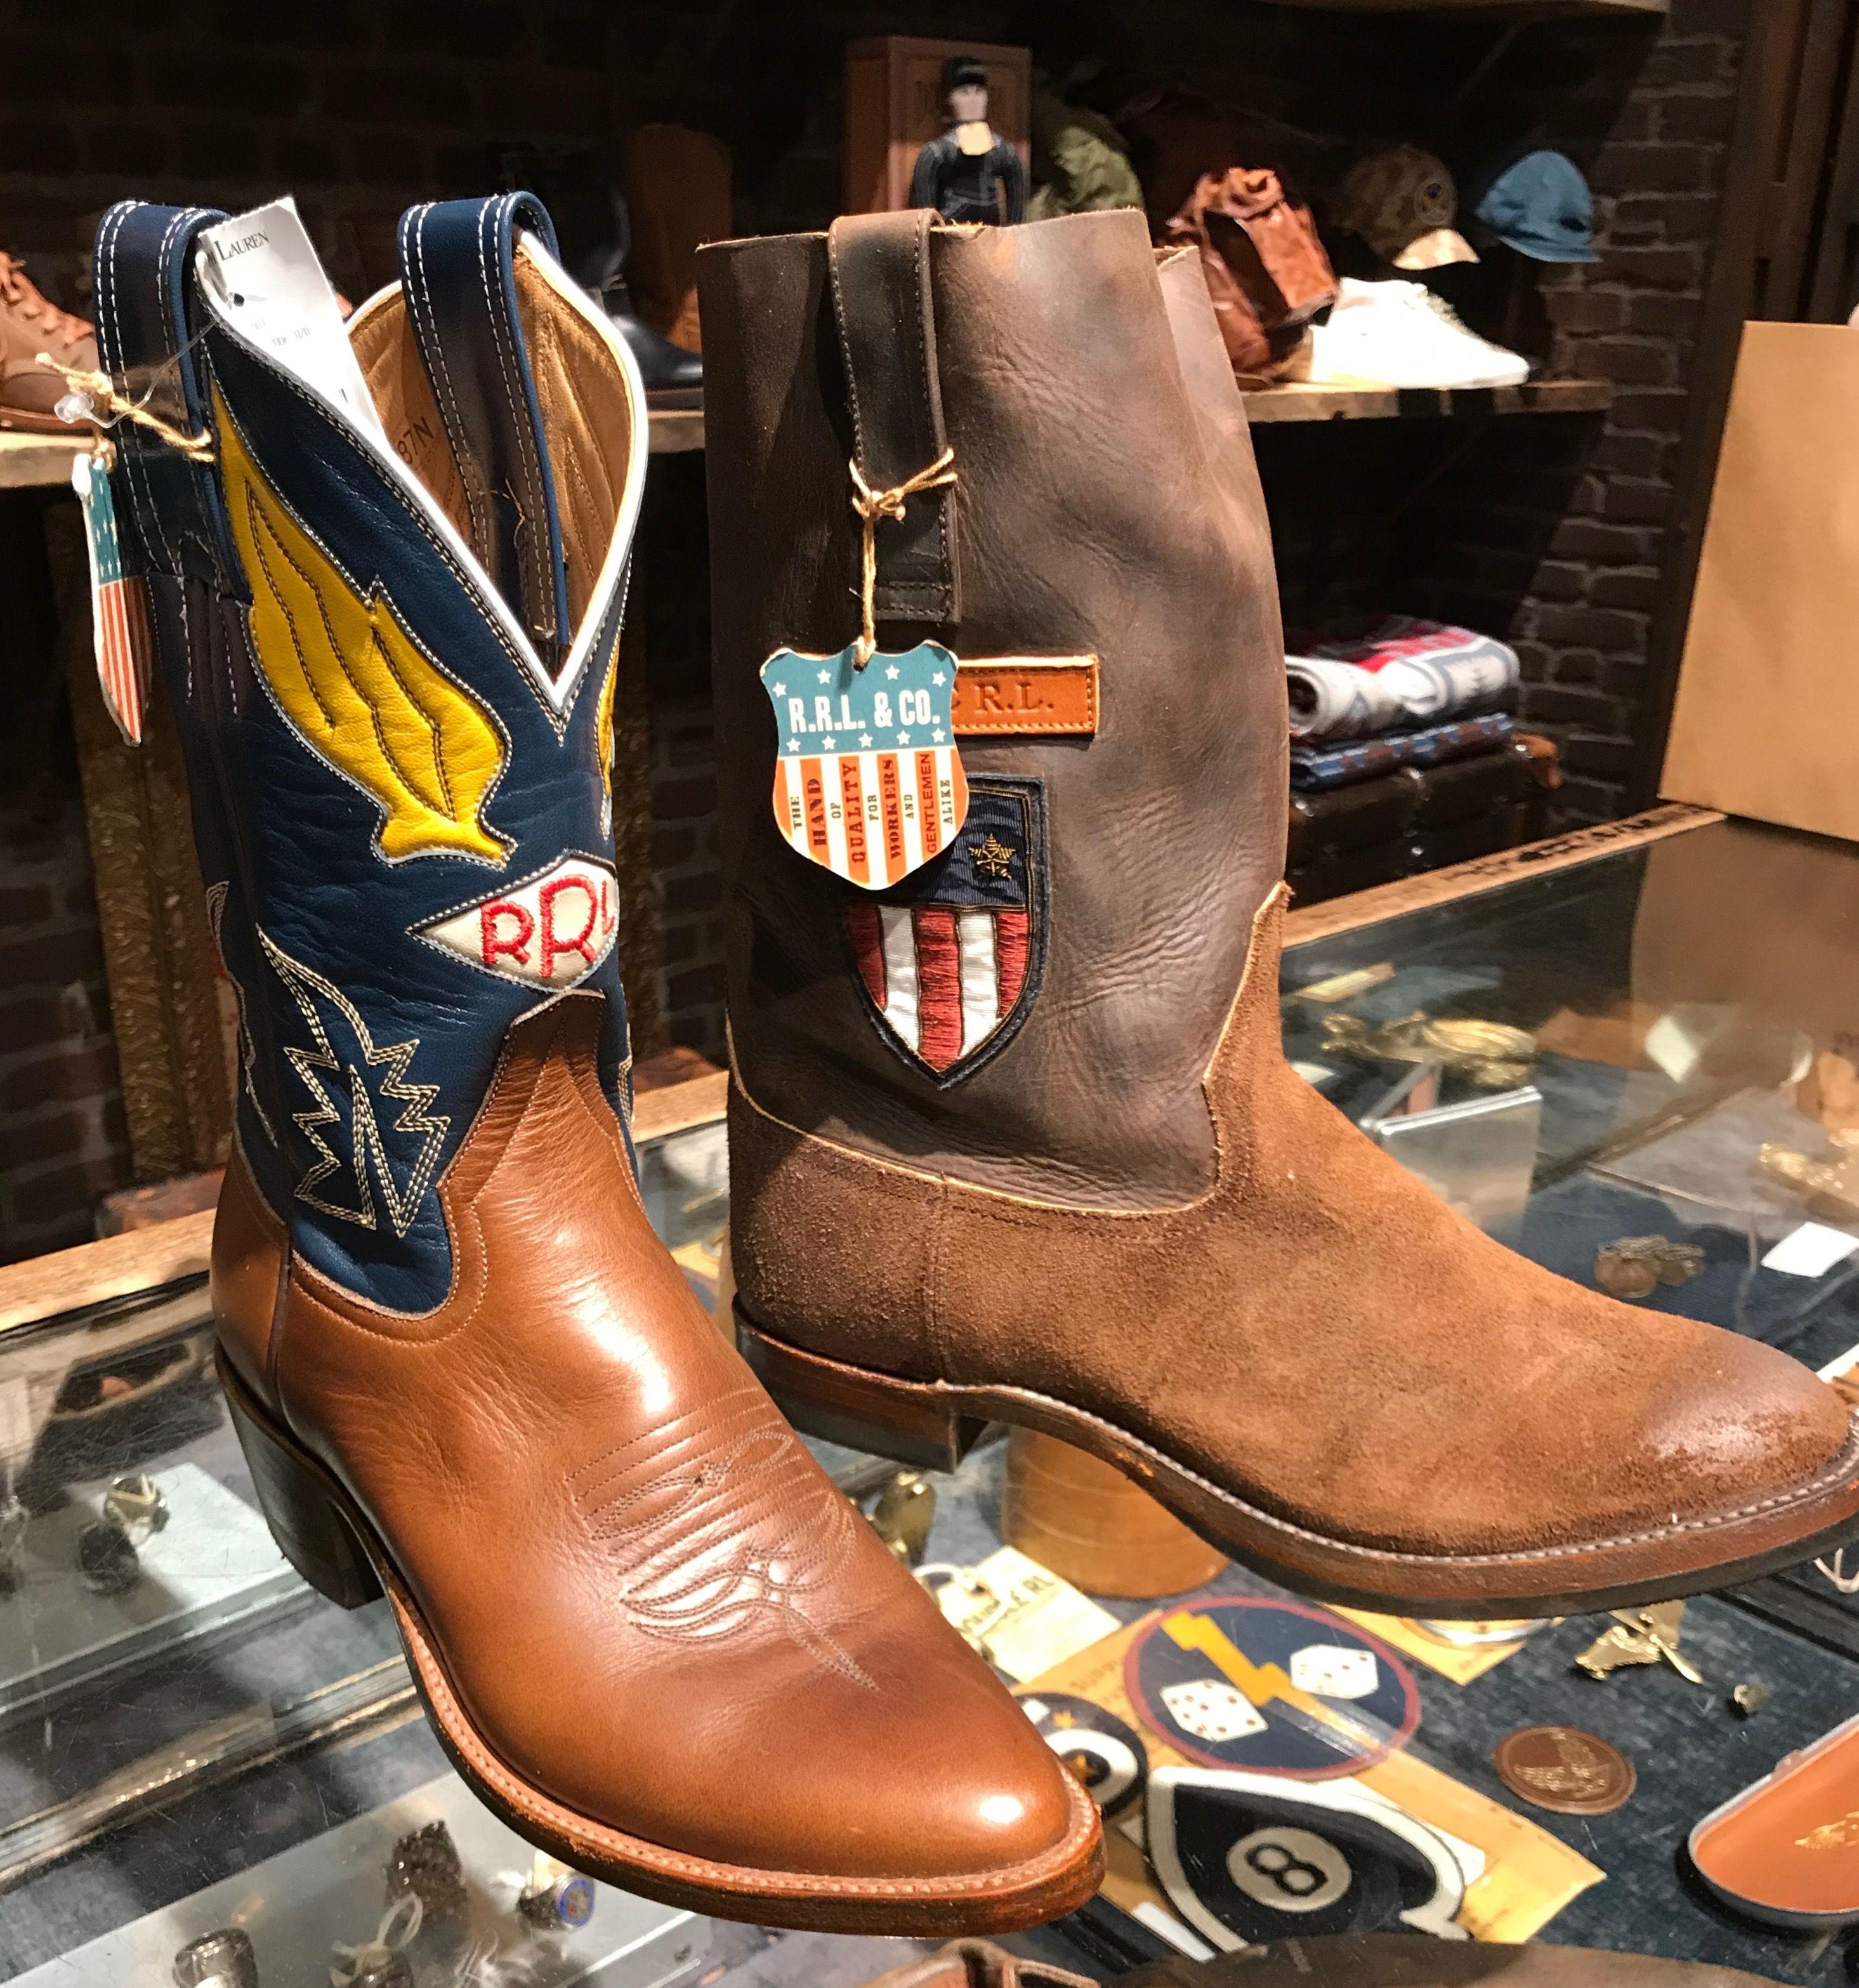 f0b4ebaff3e Ralph Lauren RRL branded cowboy boots at the RRL Soho NYC store ...